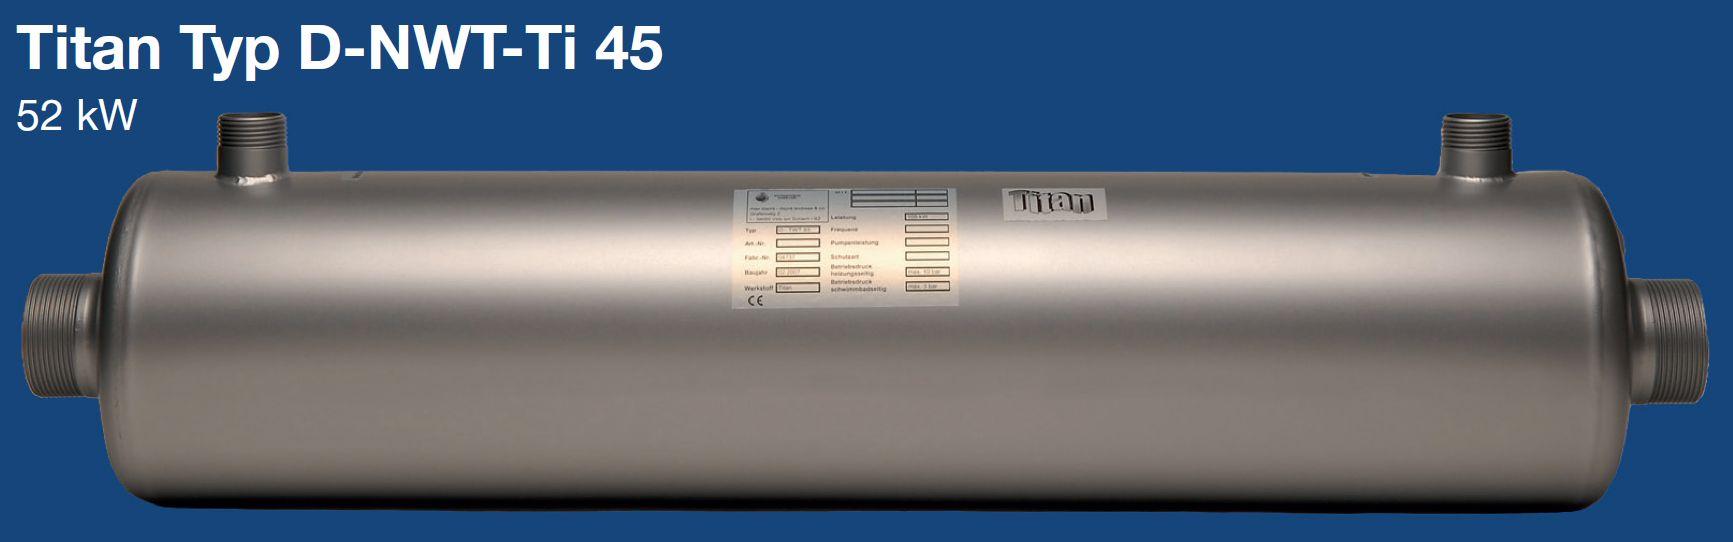 Daprà Niedertemperatur Titan Heizungs-Wärme-Tauscher D-NWT-Ti 45 kW Killus-Technik.de